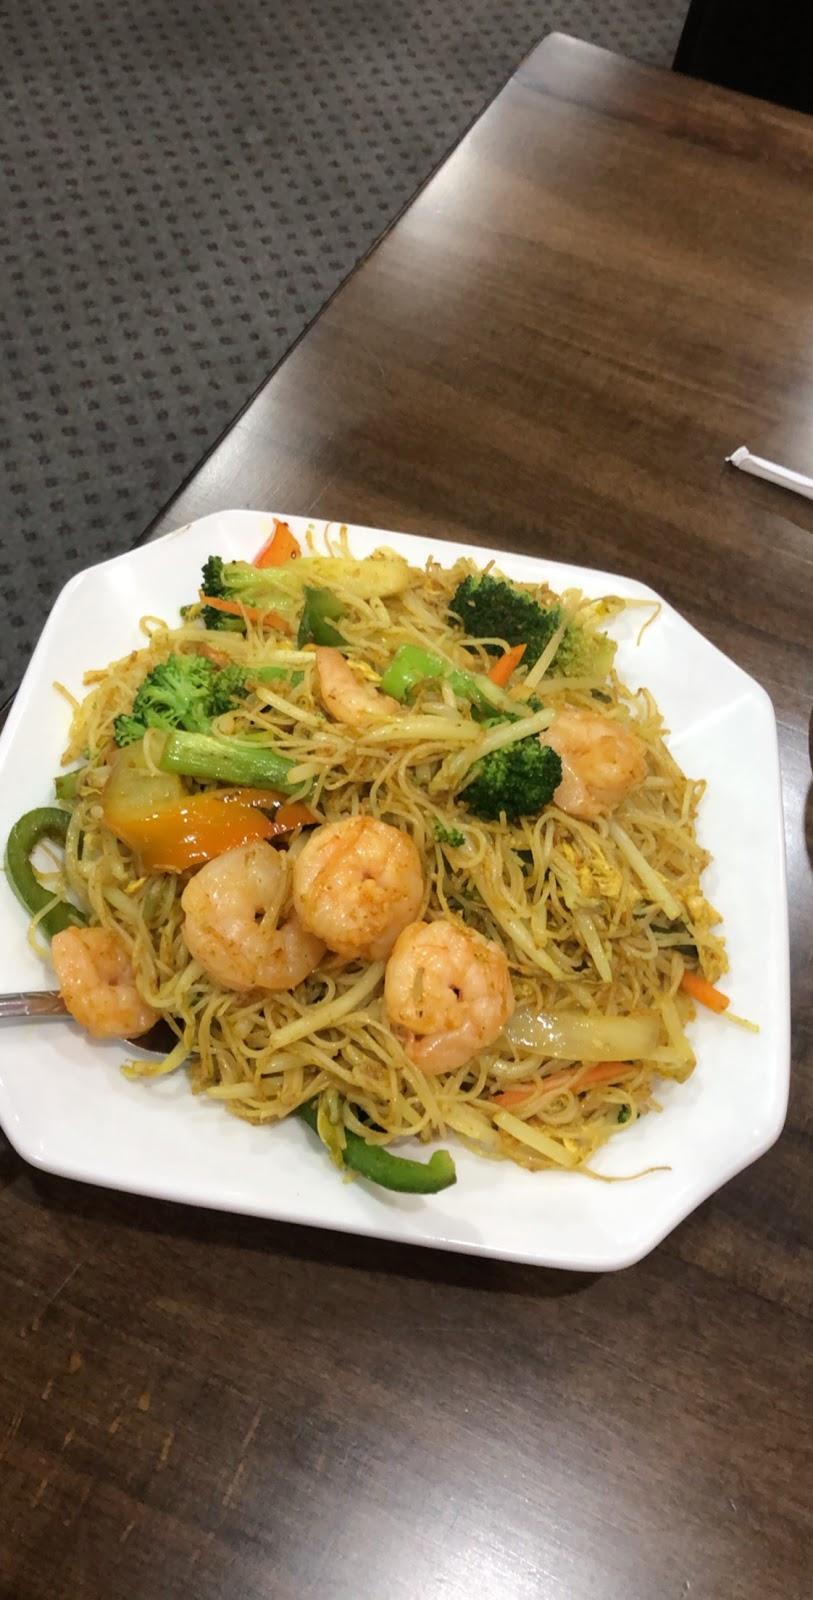 China House Inn - restaurant  | Photo 2 of 10 | Address: 33602 W Seven Mile Rd, Livonia, MI 48152, USA | Phone: (248) 888-9540